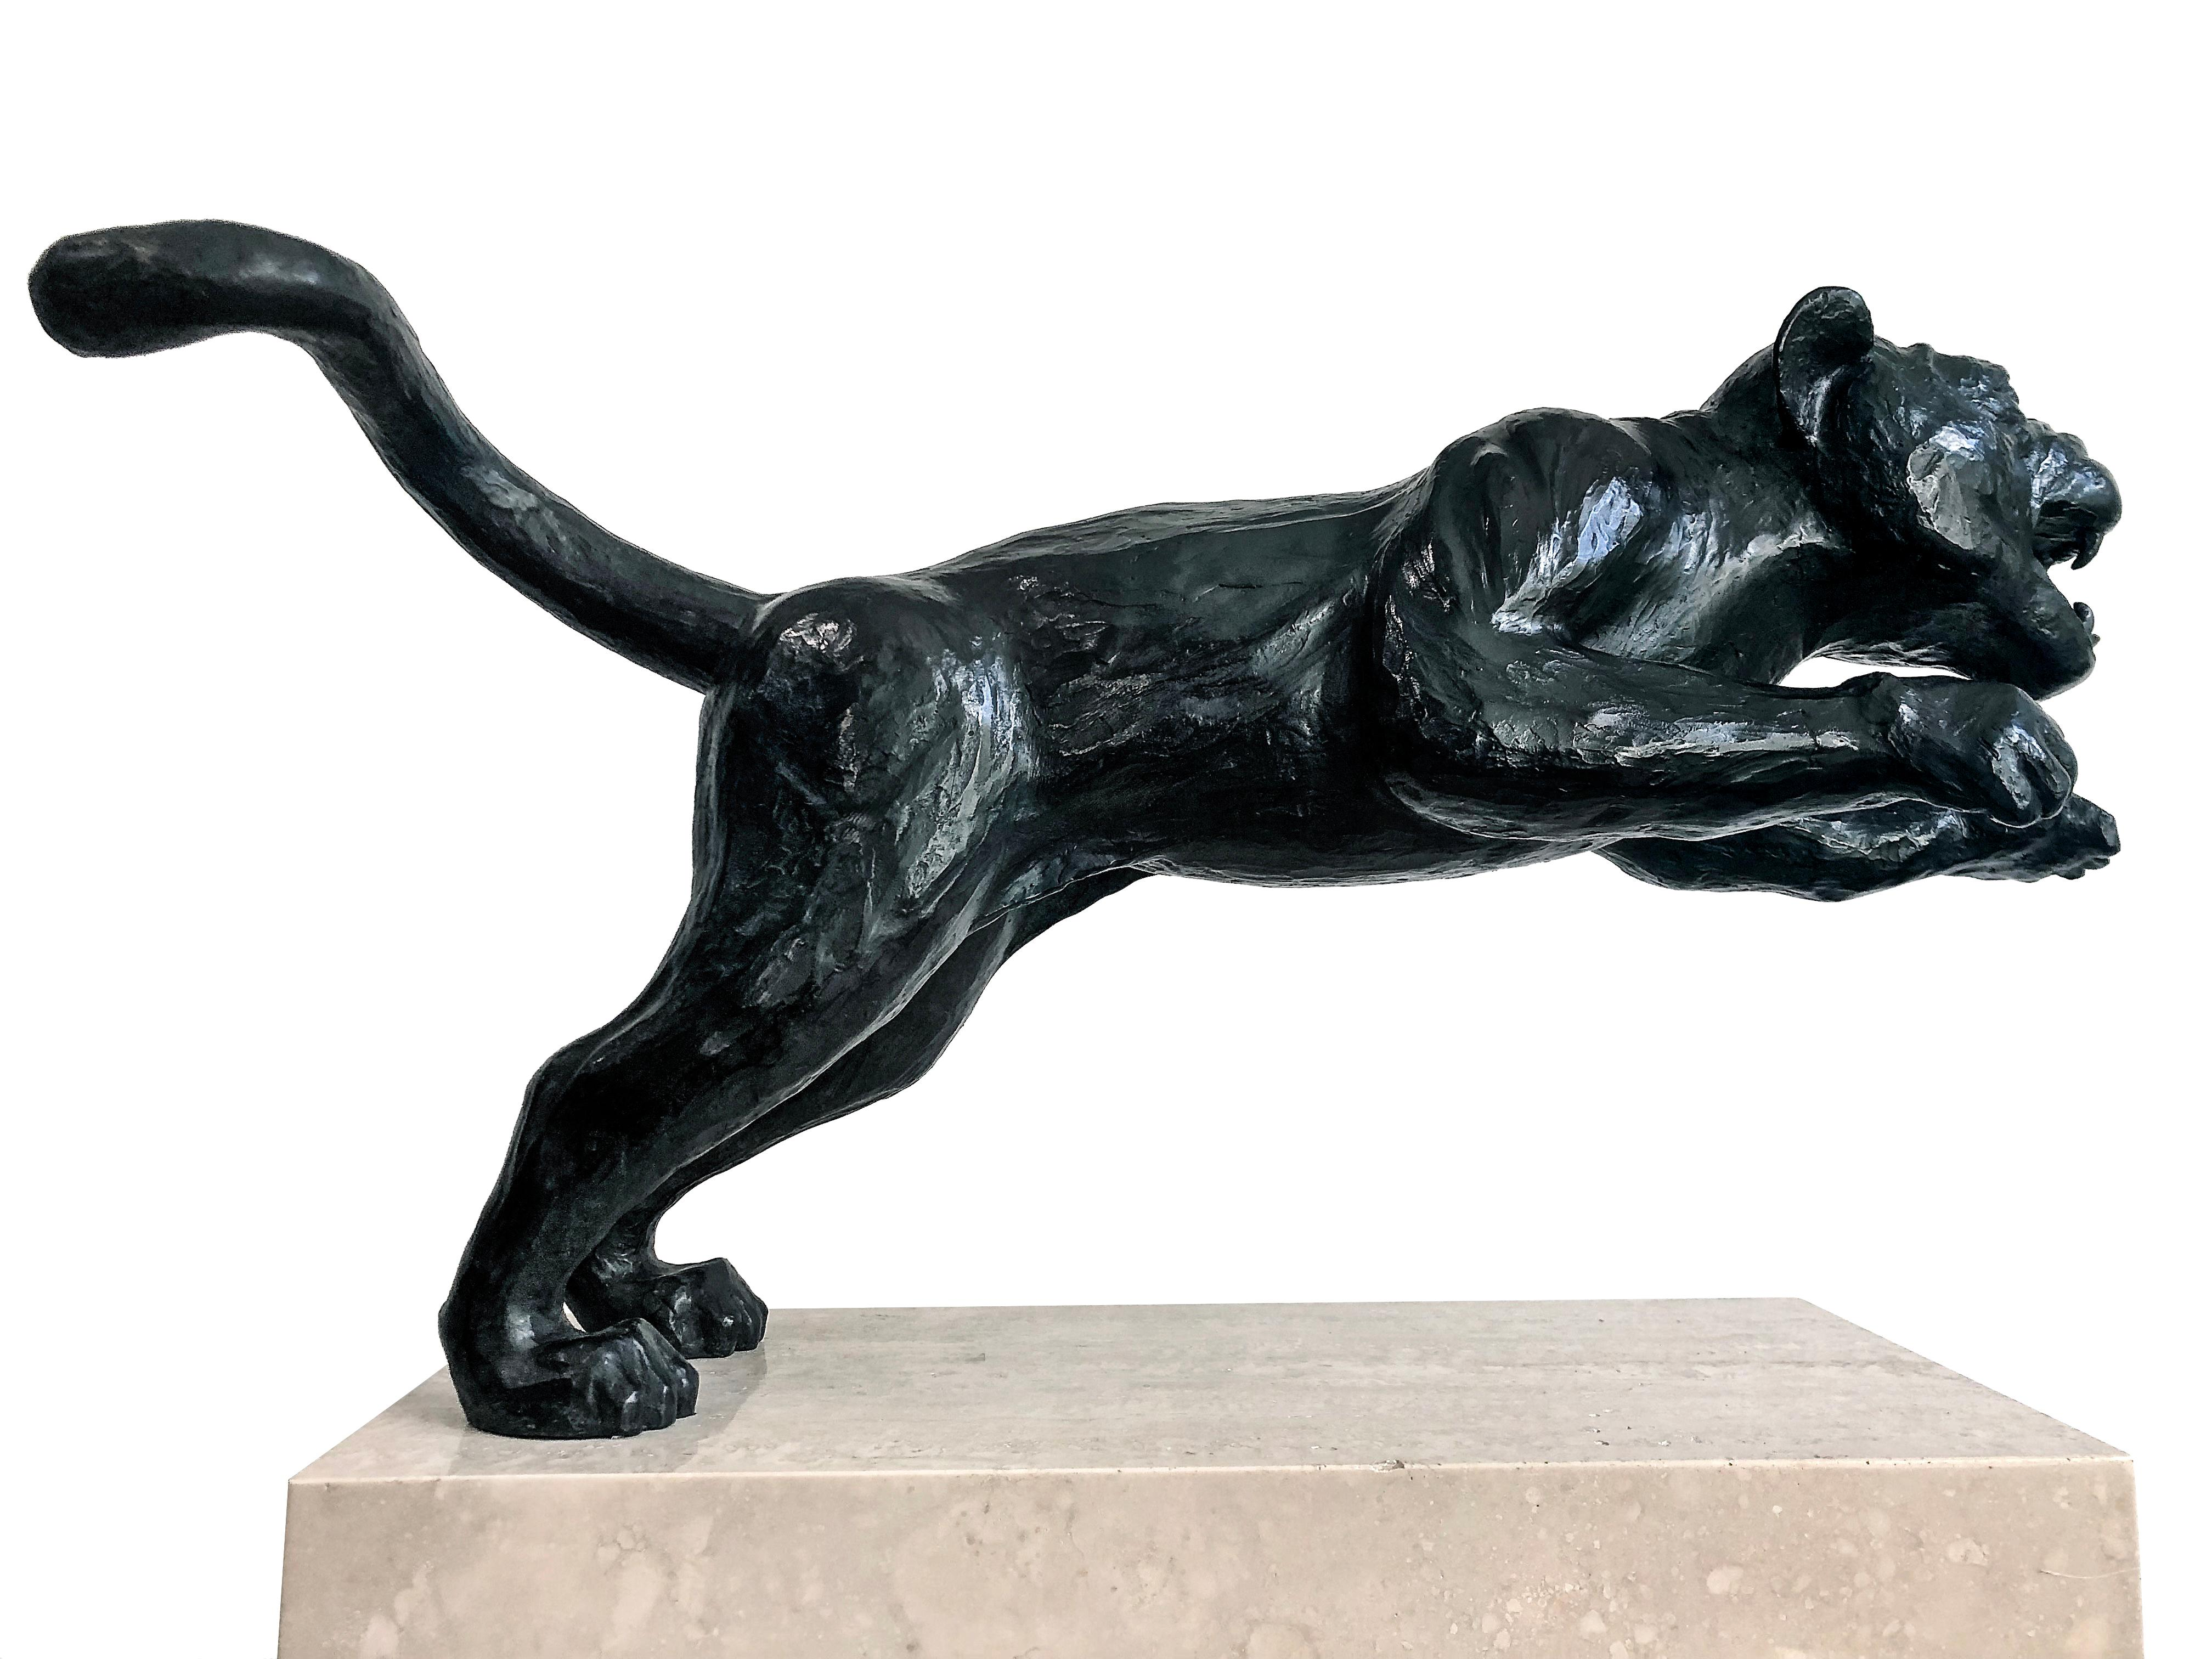 Black Panther Bronze Sculpture S. K. Initials